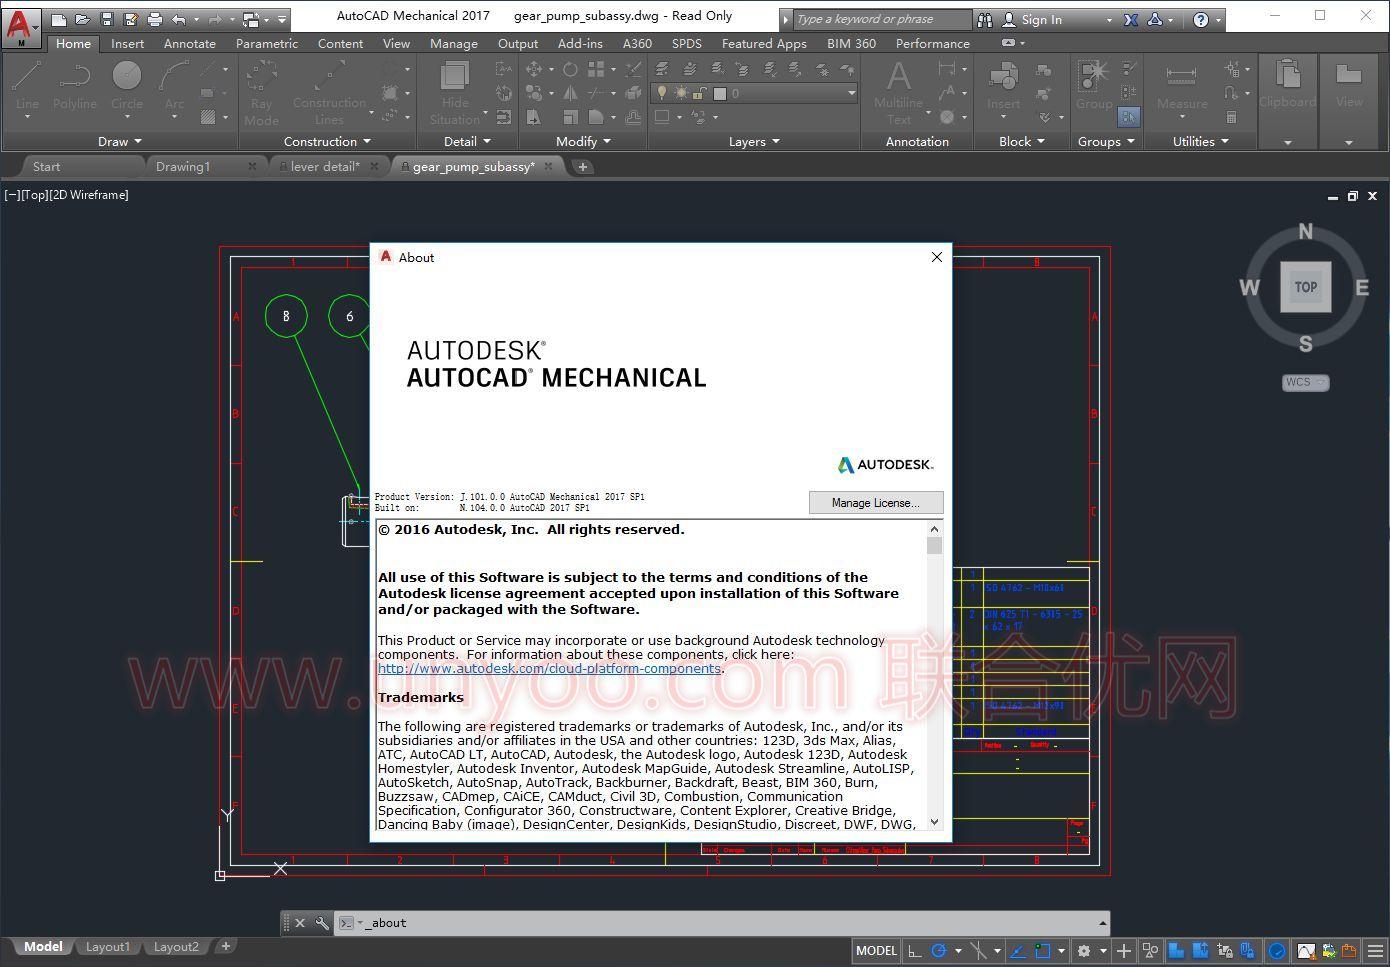 Autodesk AutoCAD Mechanical 2017 SP1 注册版附注册机-机械设计软件